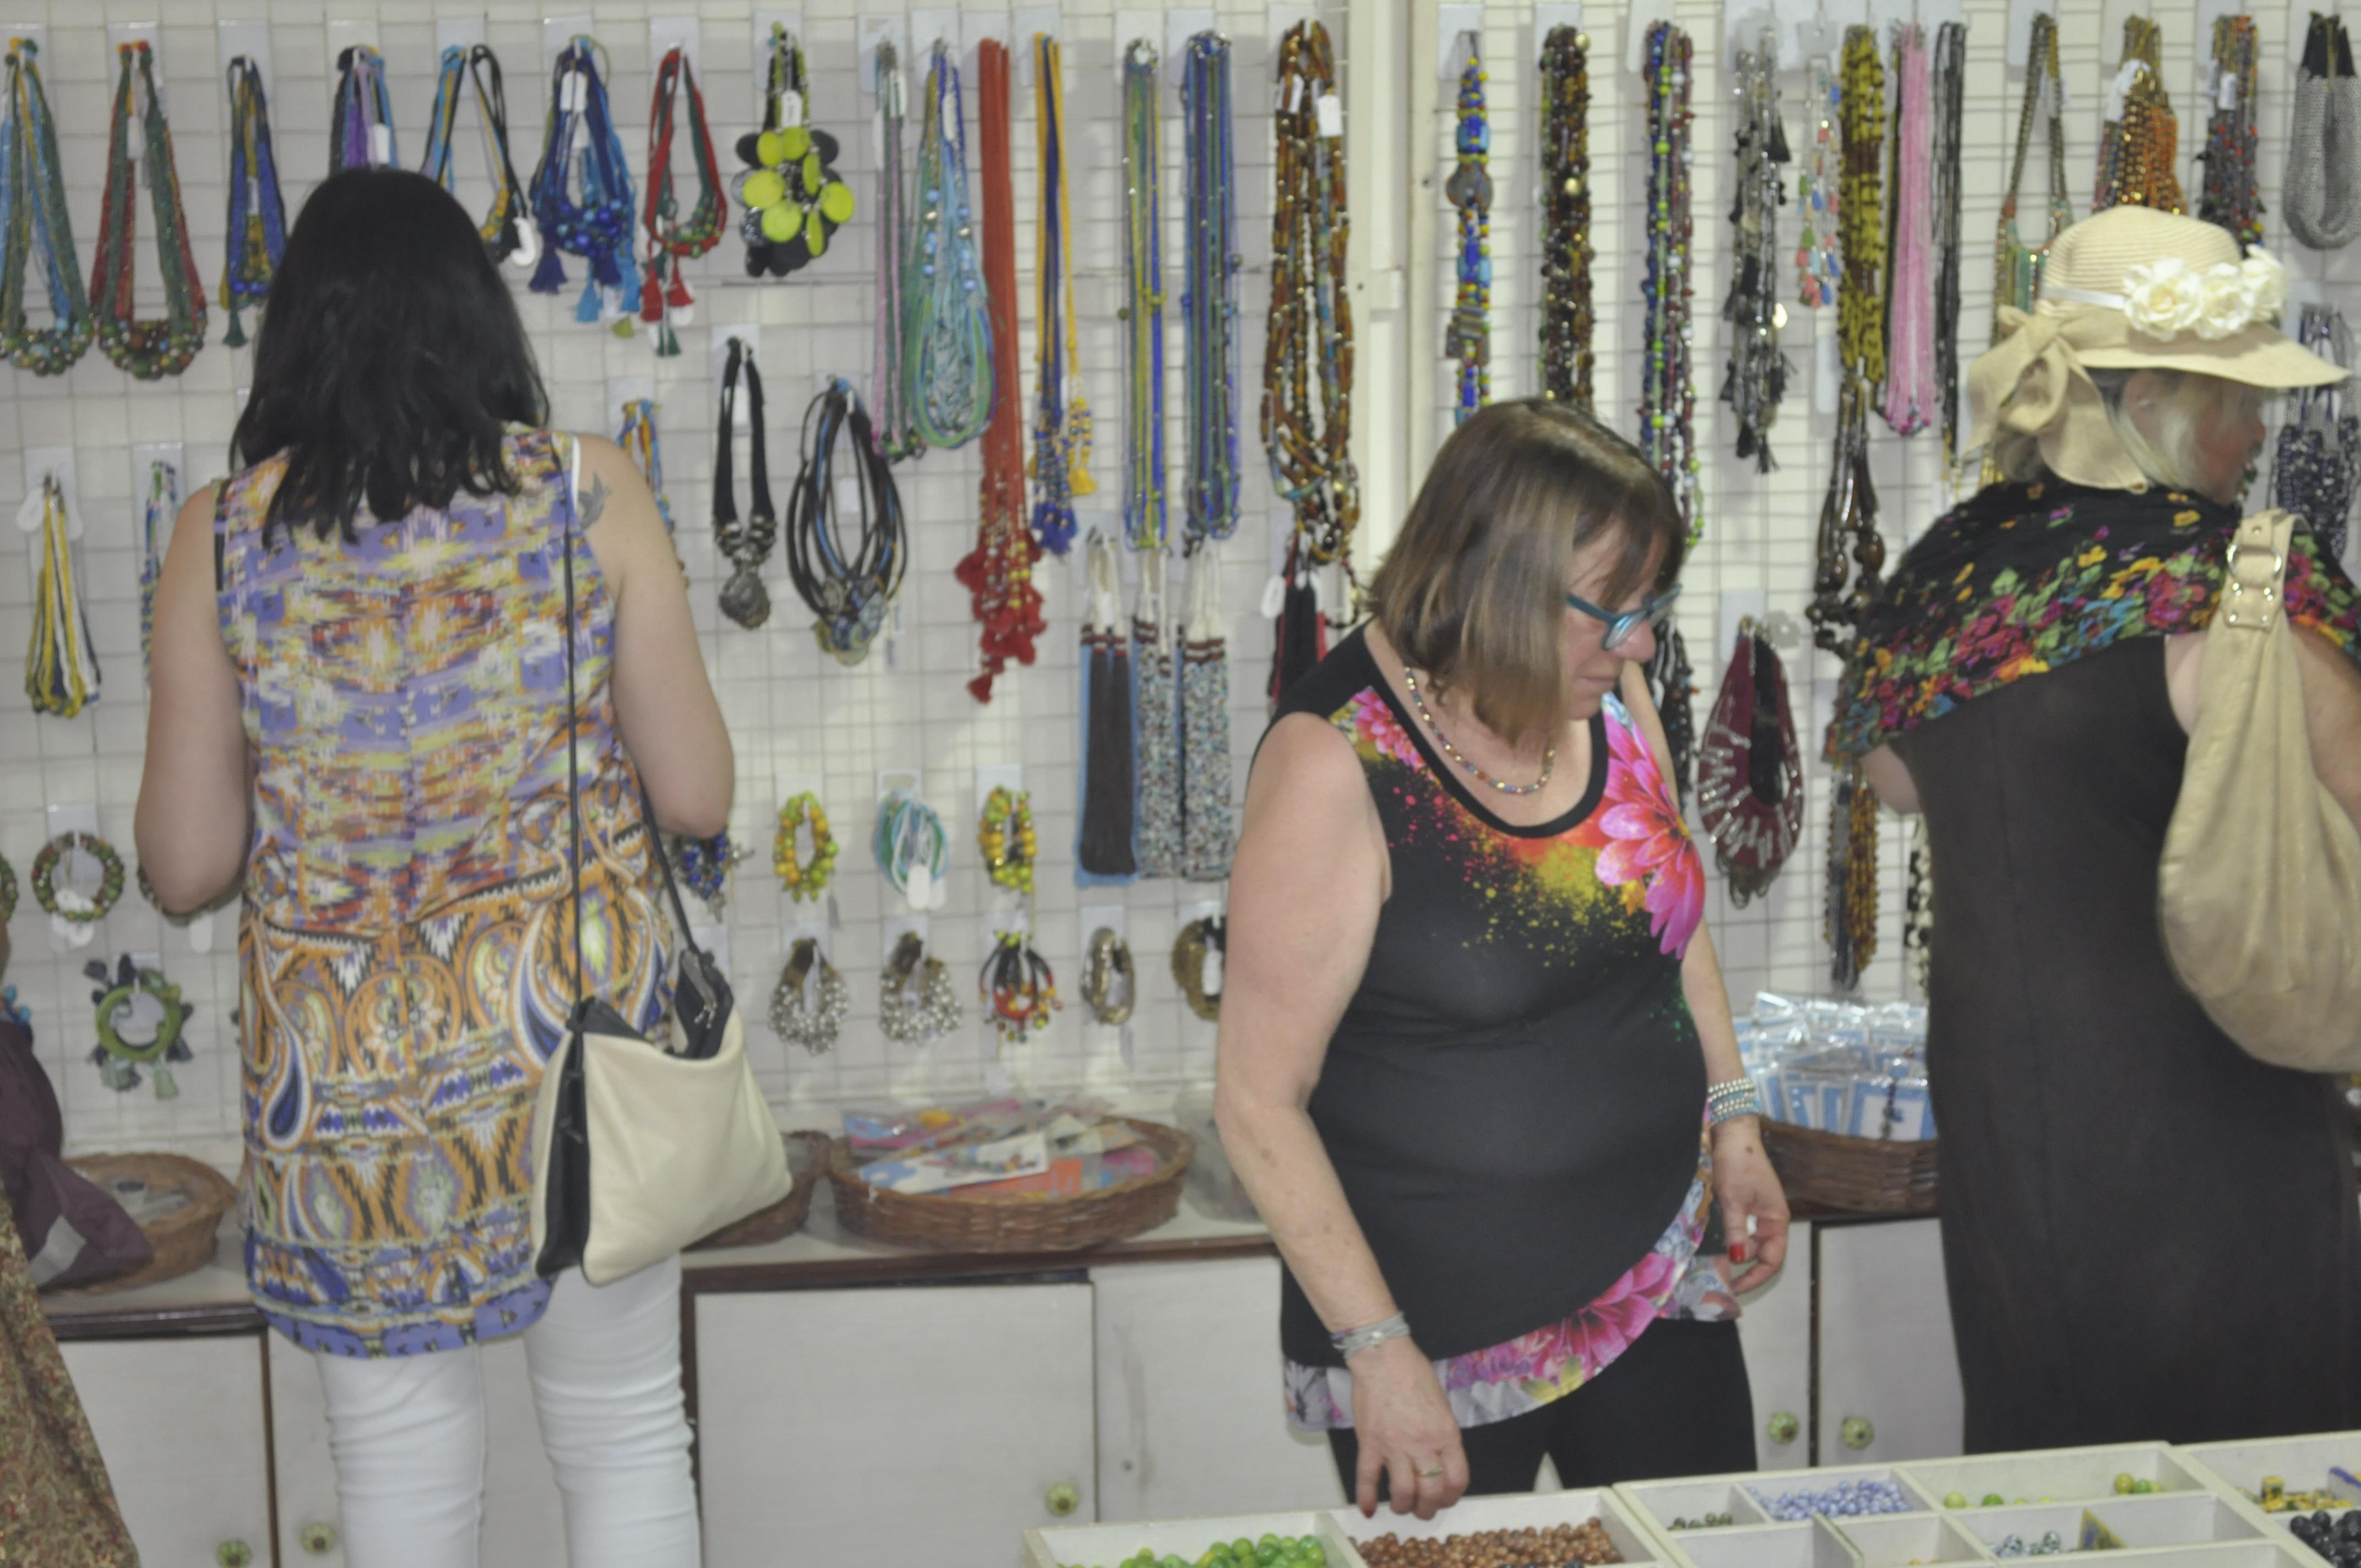 Israel ladies shopping at showroom